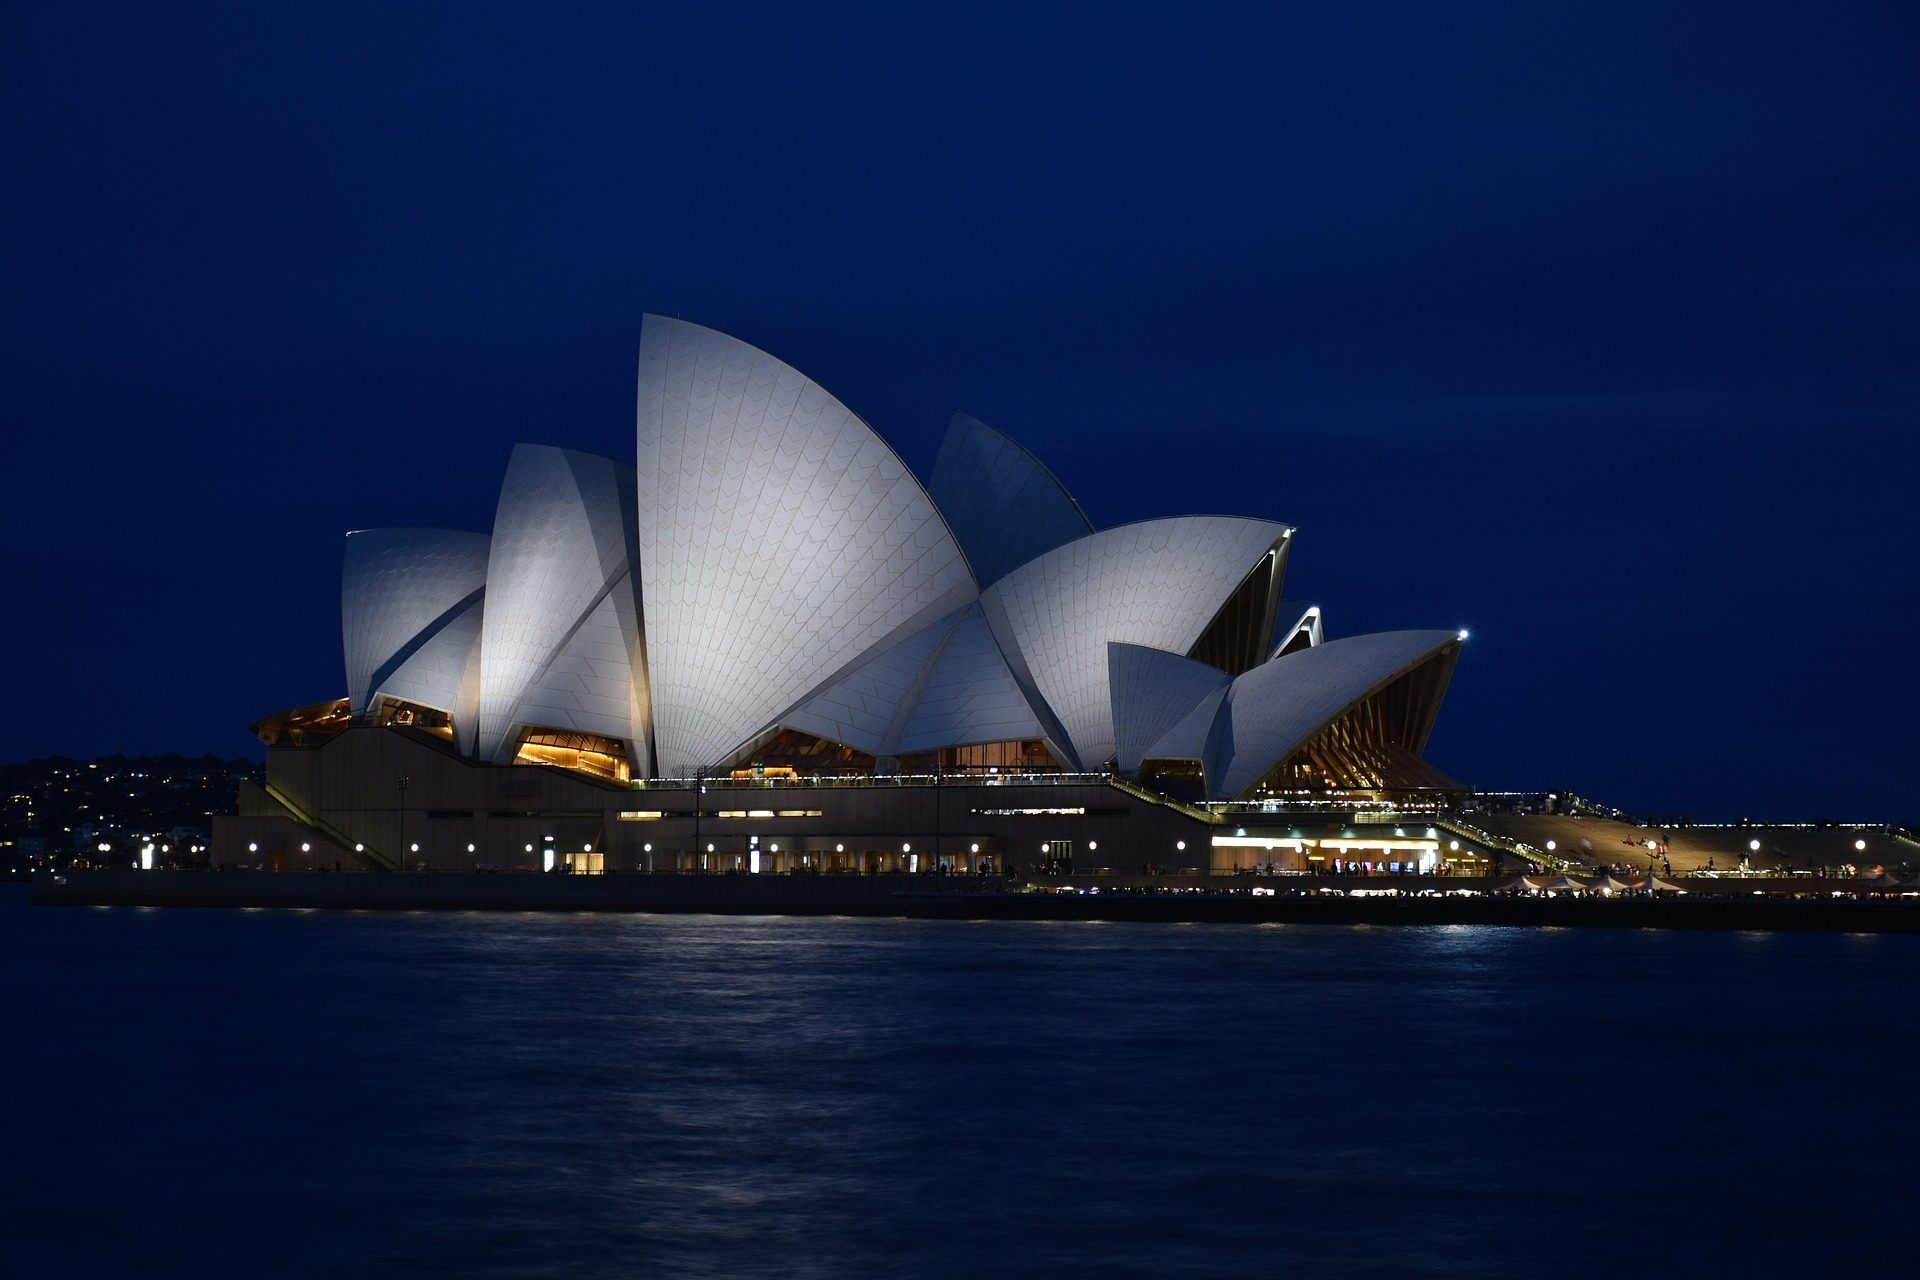 Gebäude, Architektur, Roman, Oper, Sydney, Australien - Wallpaper HD - Prof.-falken.com